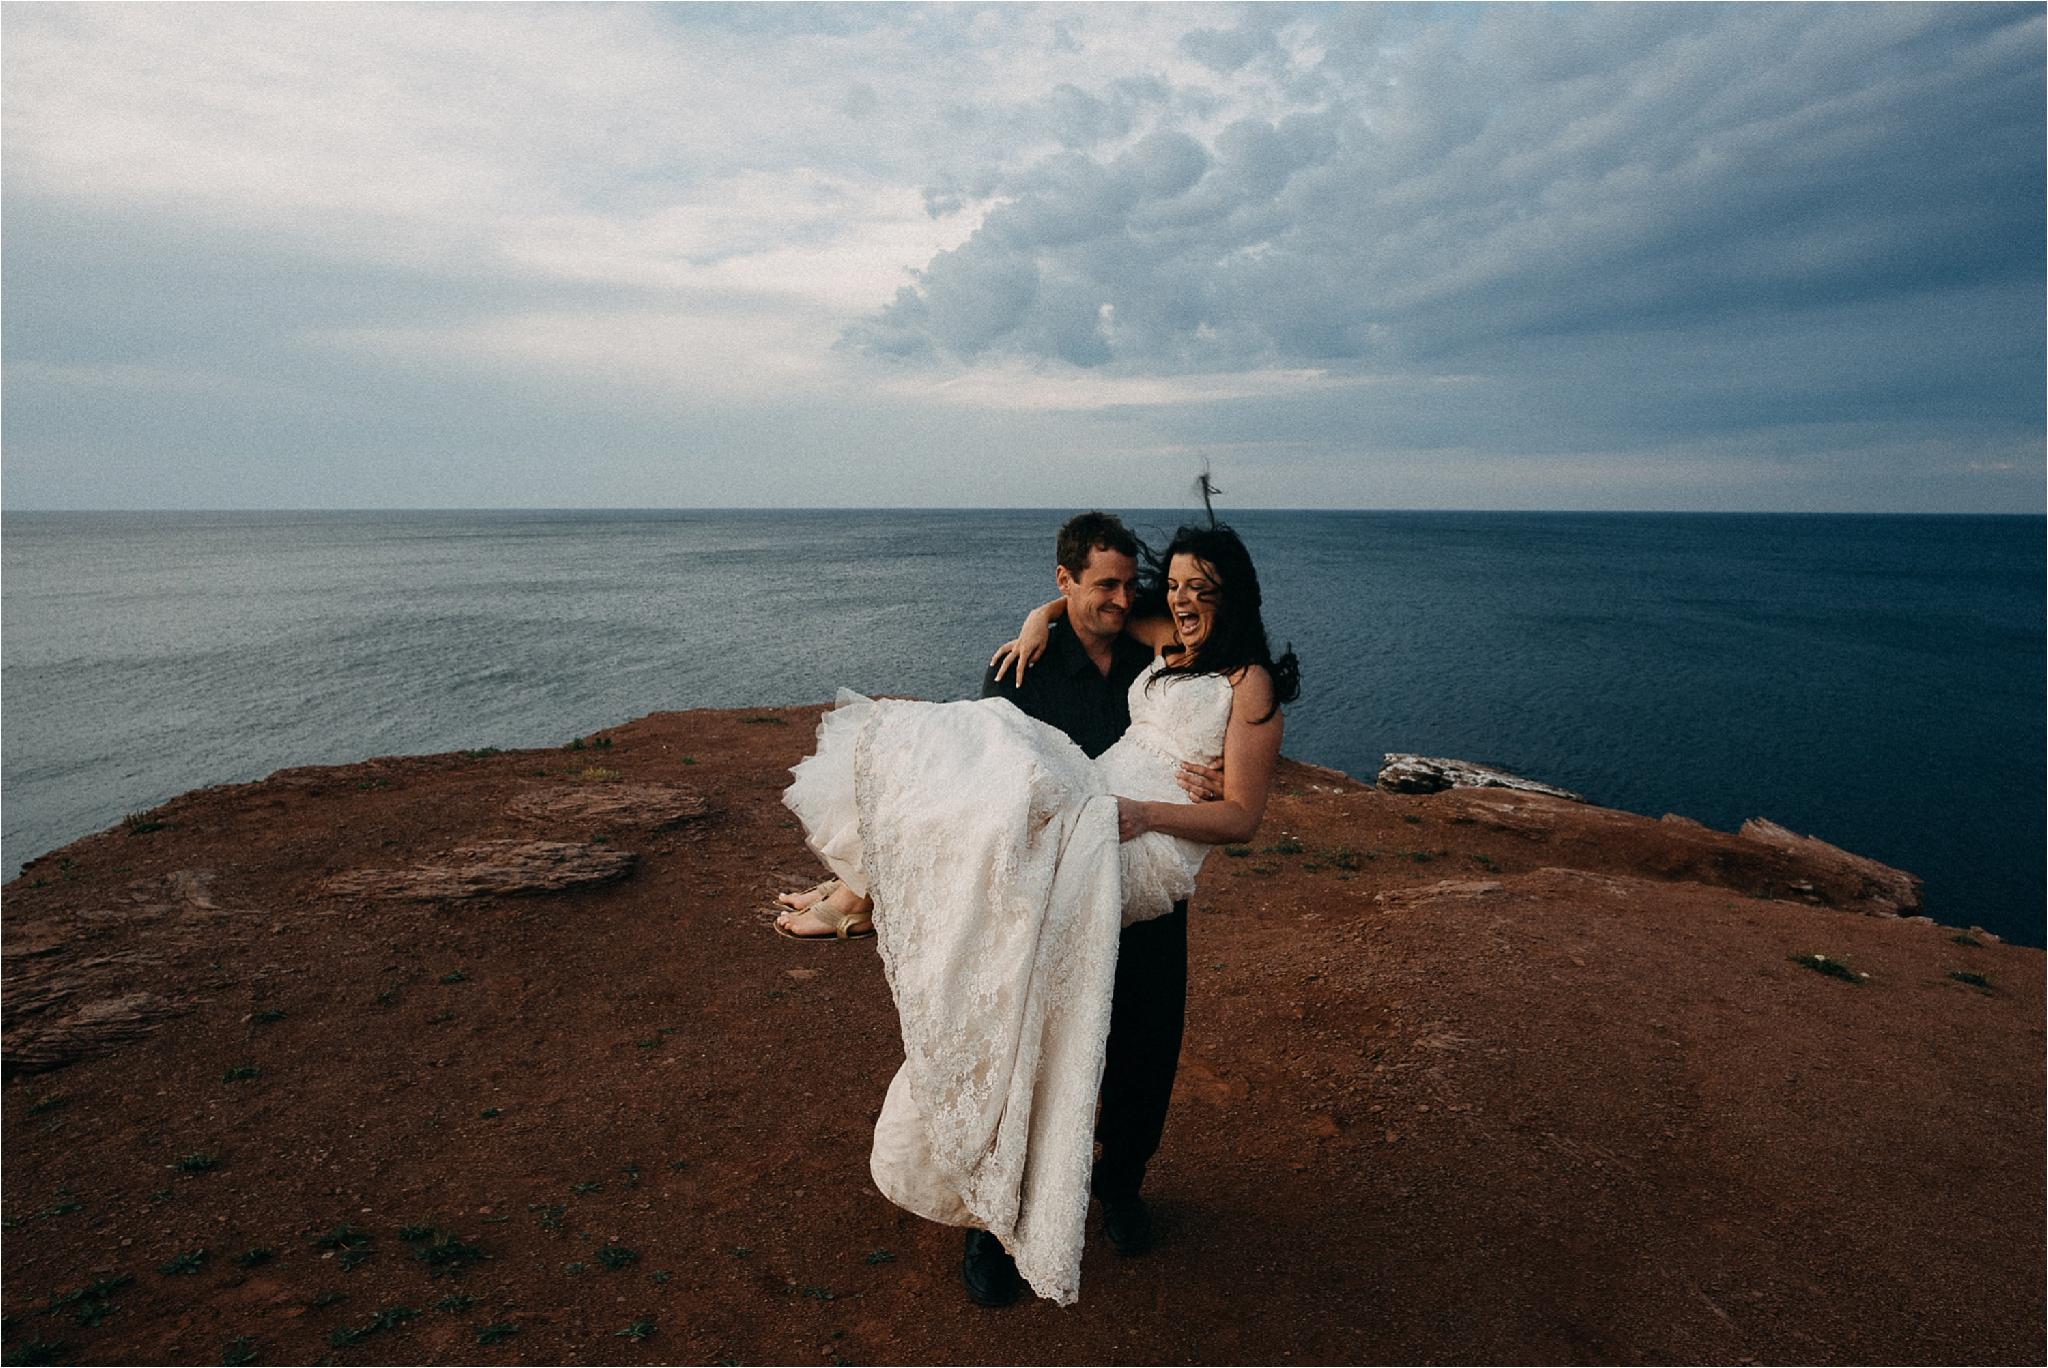 Adventure Session in Thunder Cove - Prince Edward Island Photographer - Tasha and Scott